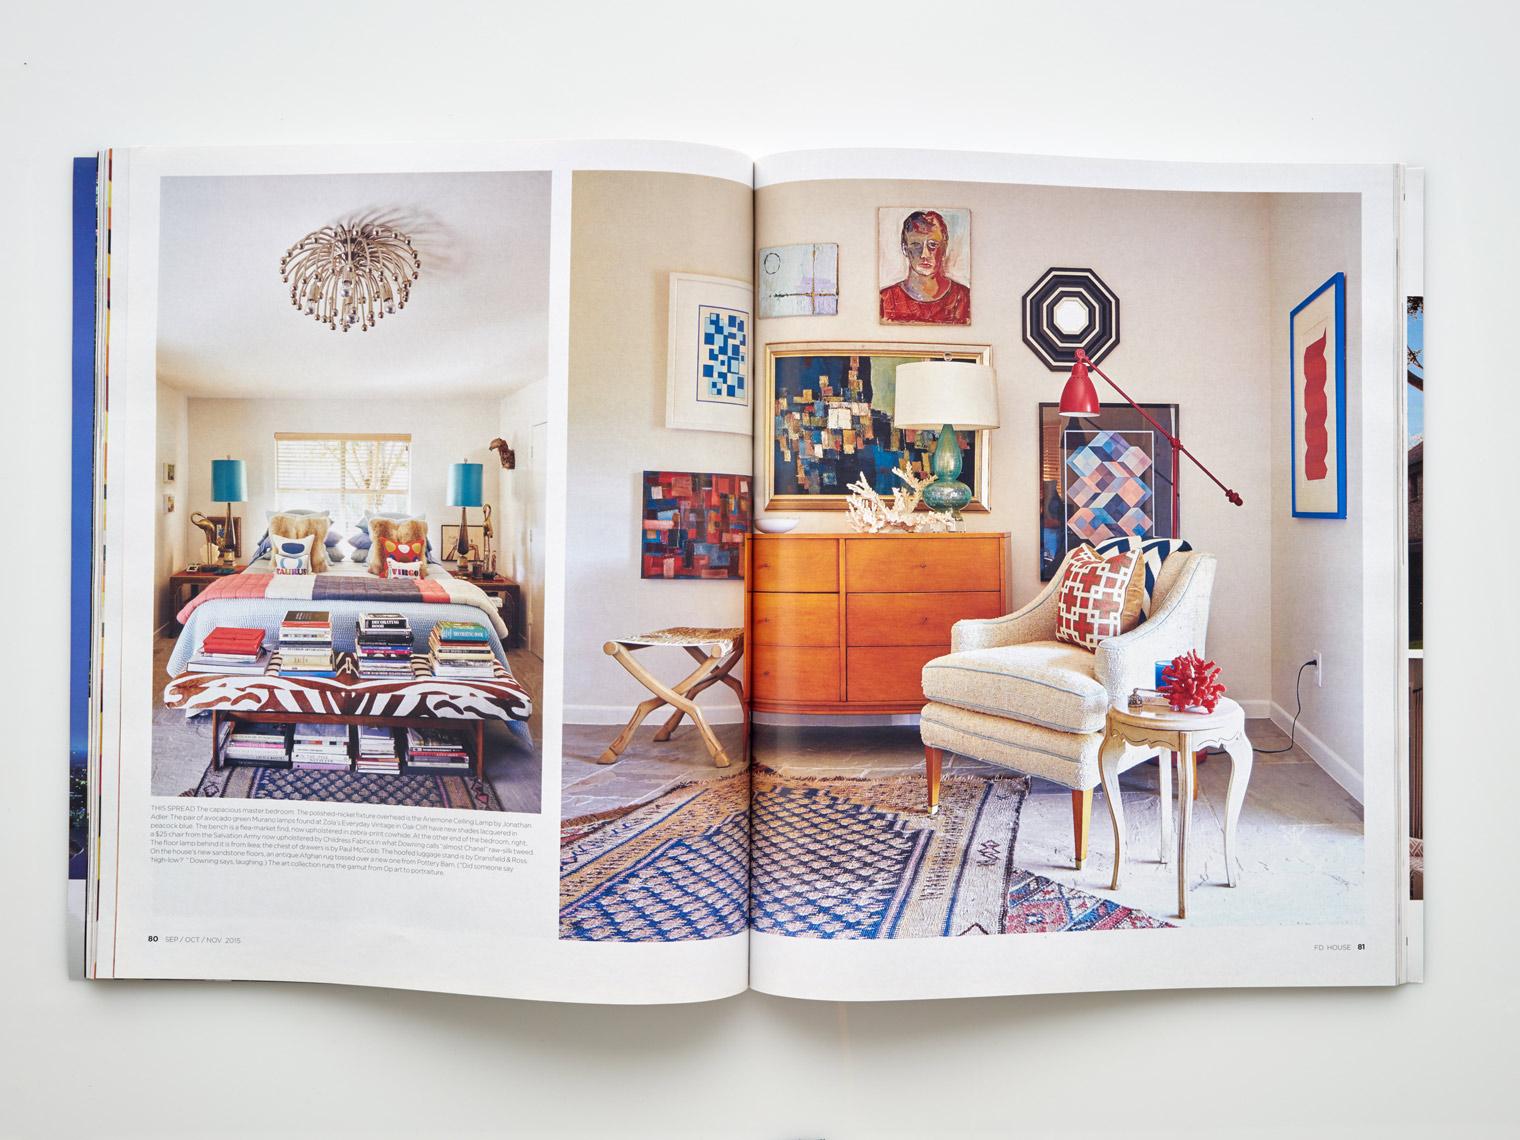 Stephen Karlisch FD House Holiday In Bedroom